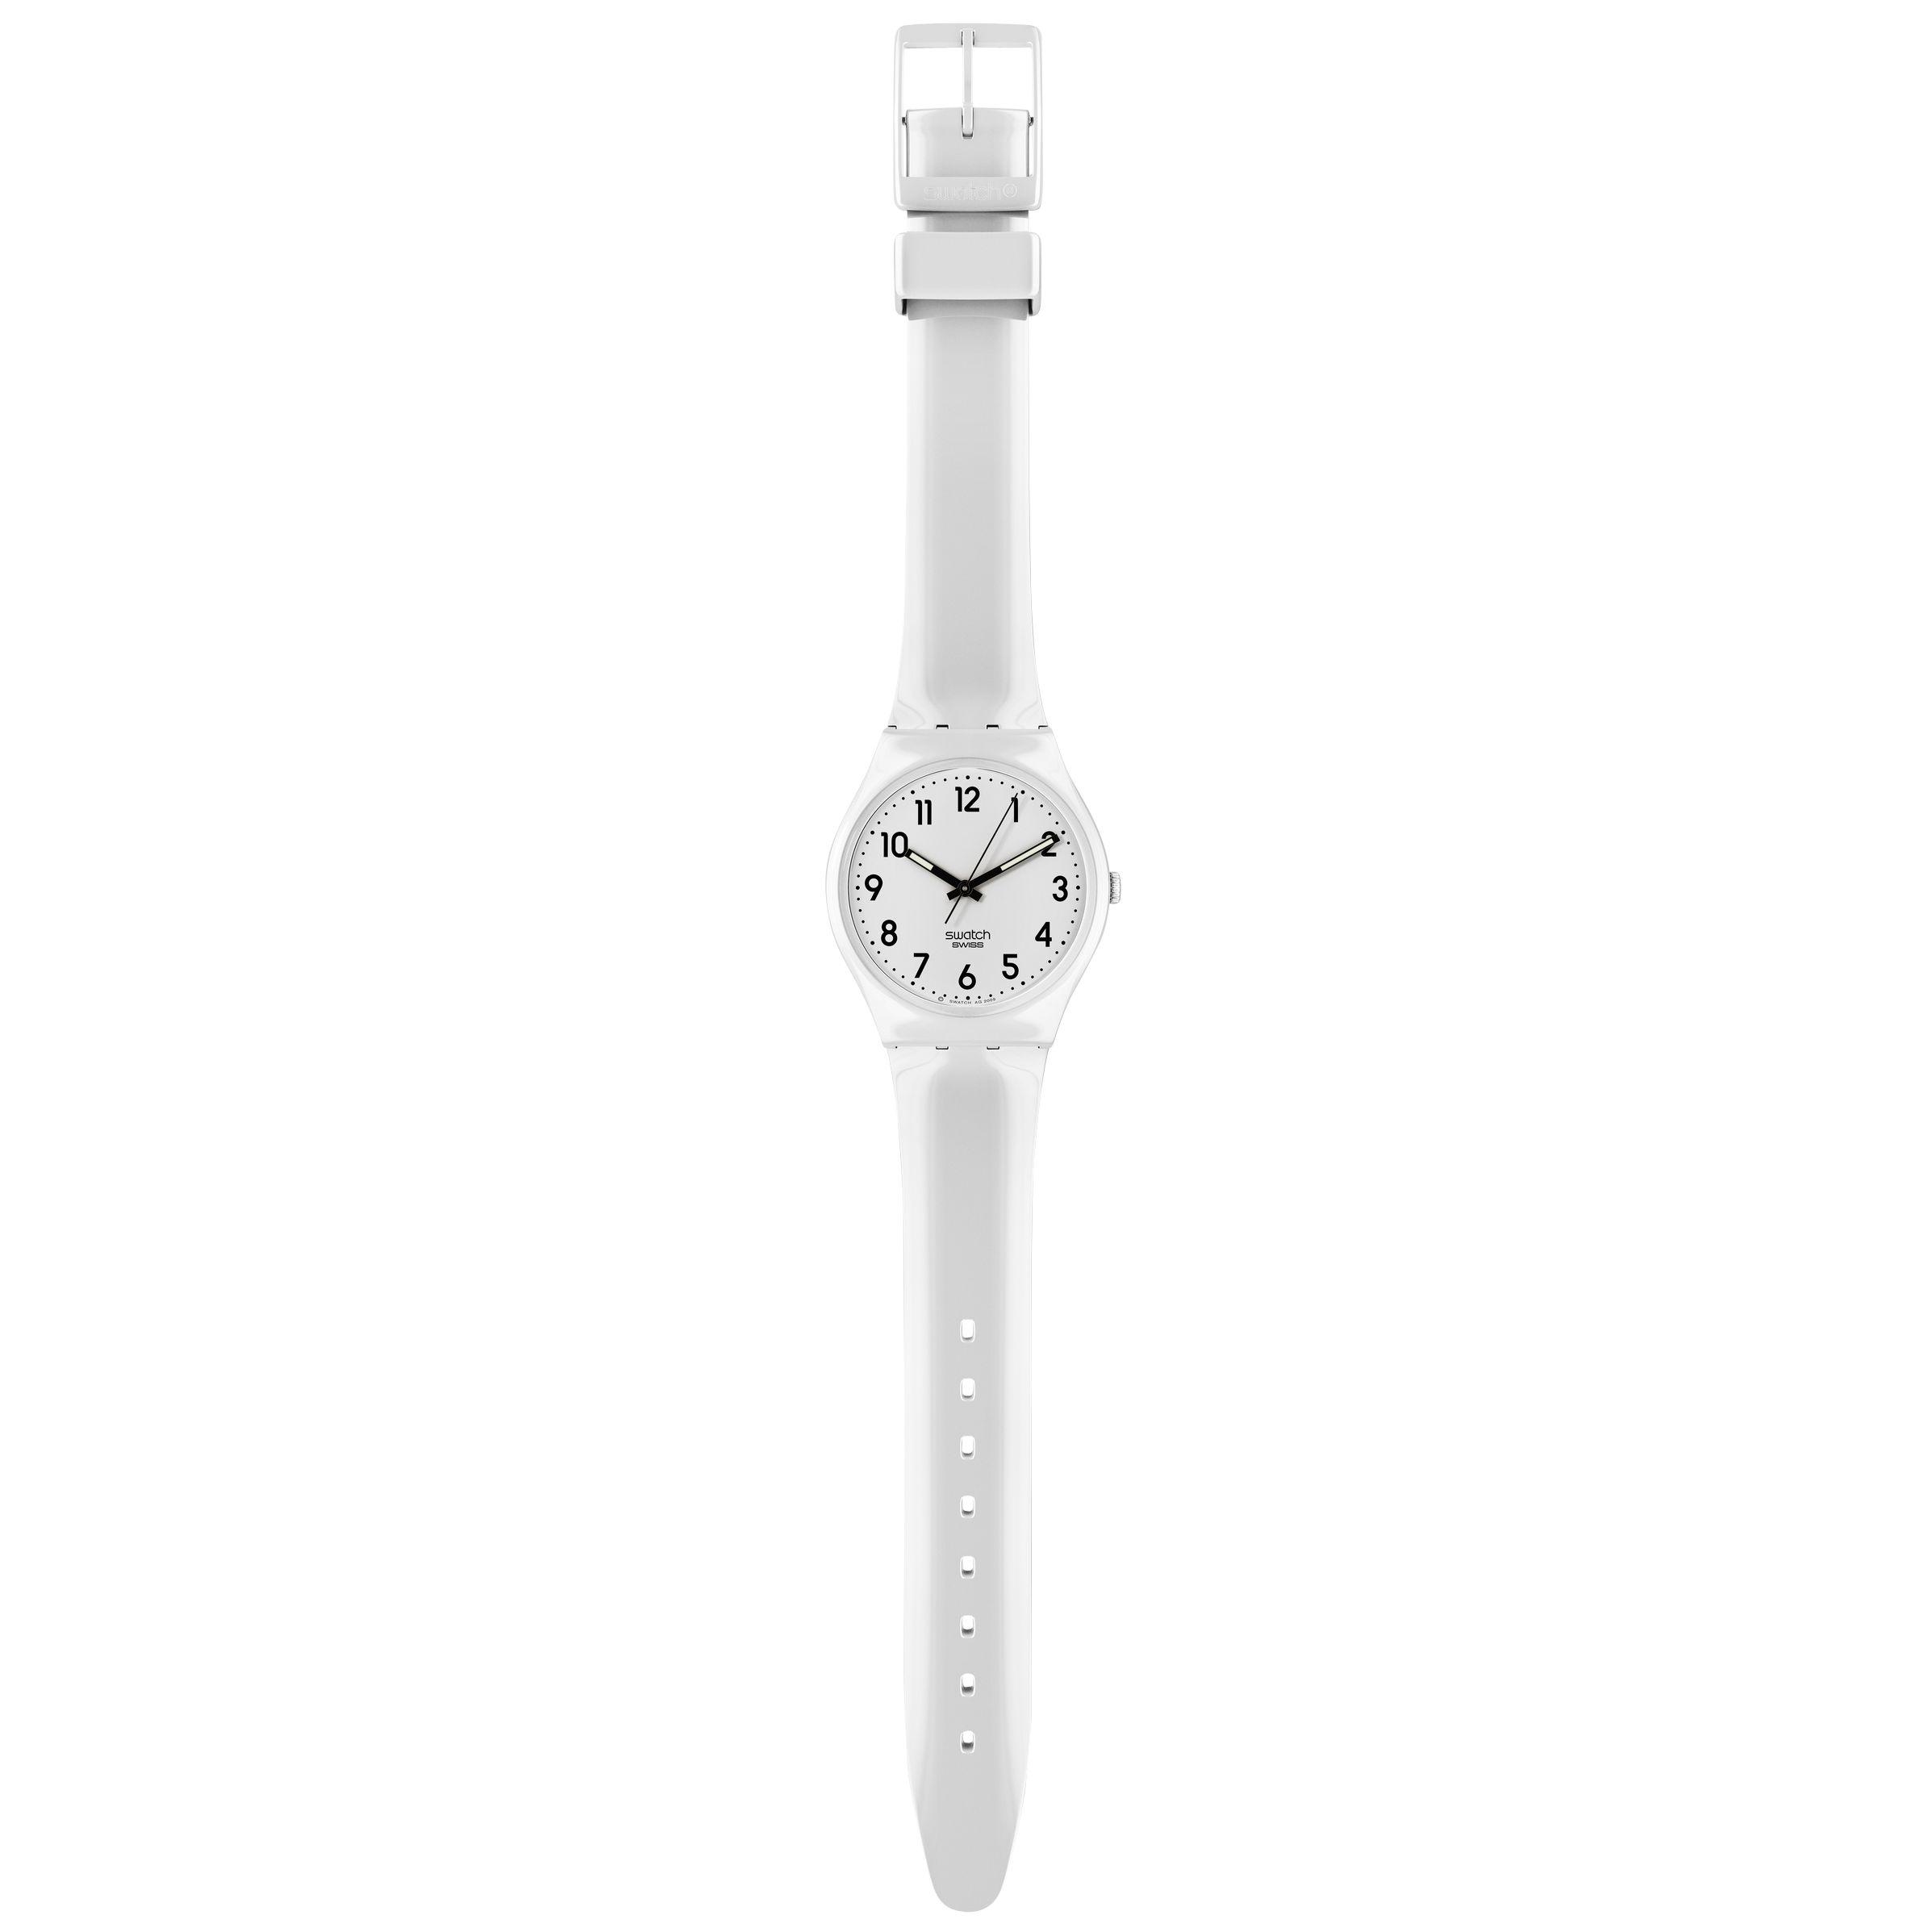 Swatch GW151 Multi-Bi Unisex Analogue Strap Watch, White